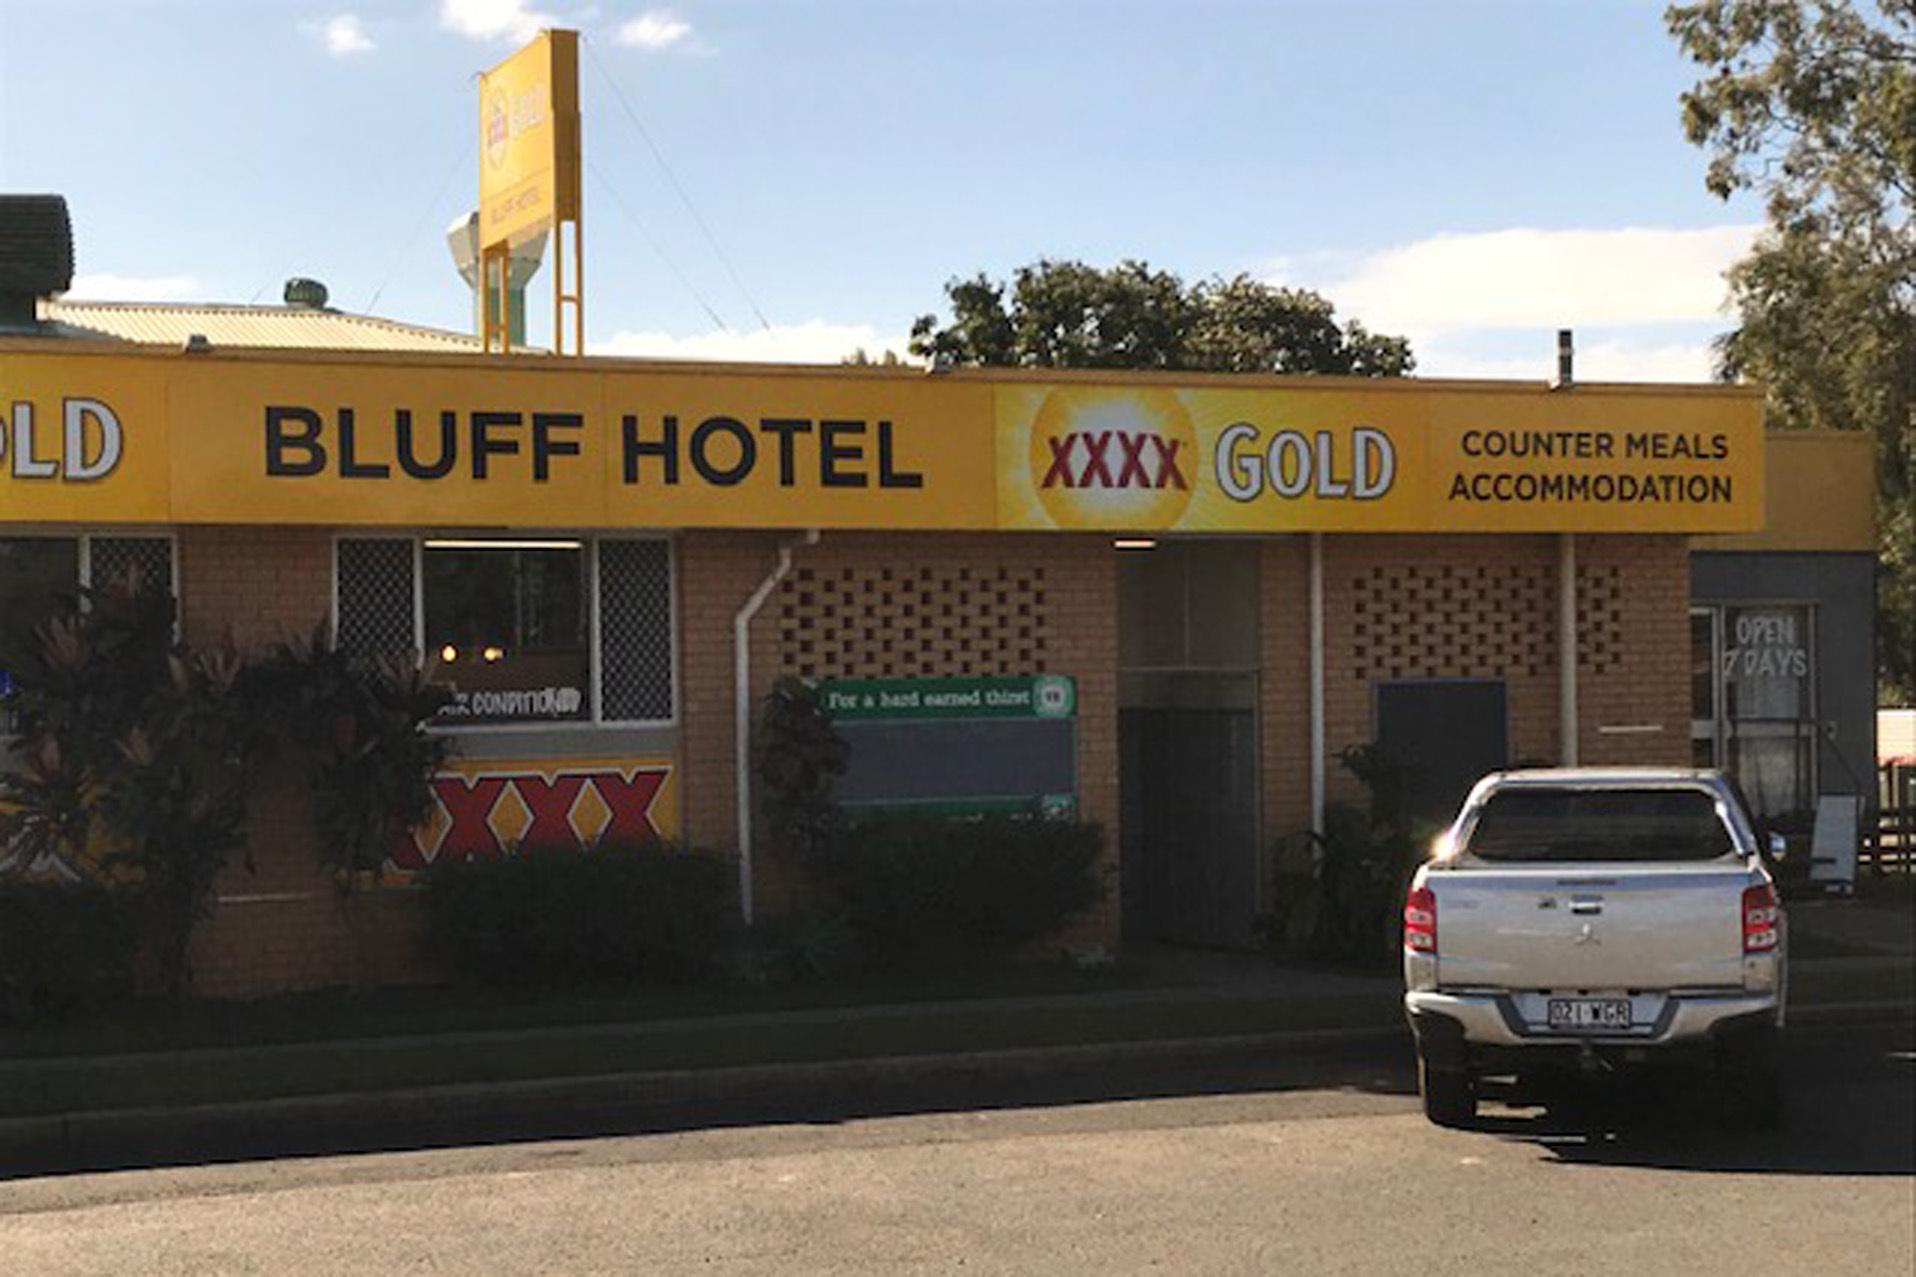 e - Bluff Hotel and Caravan Park